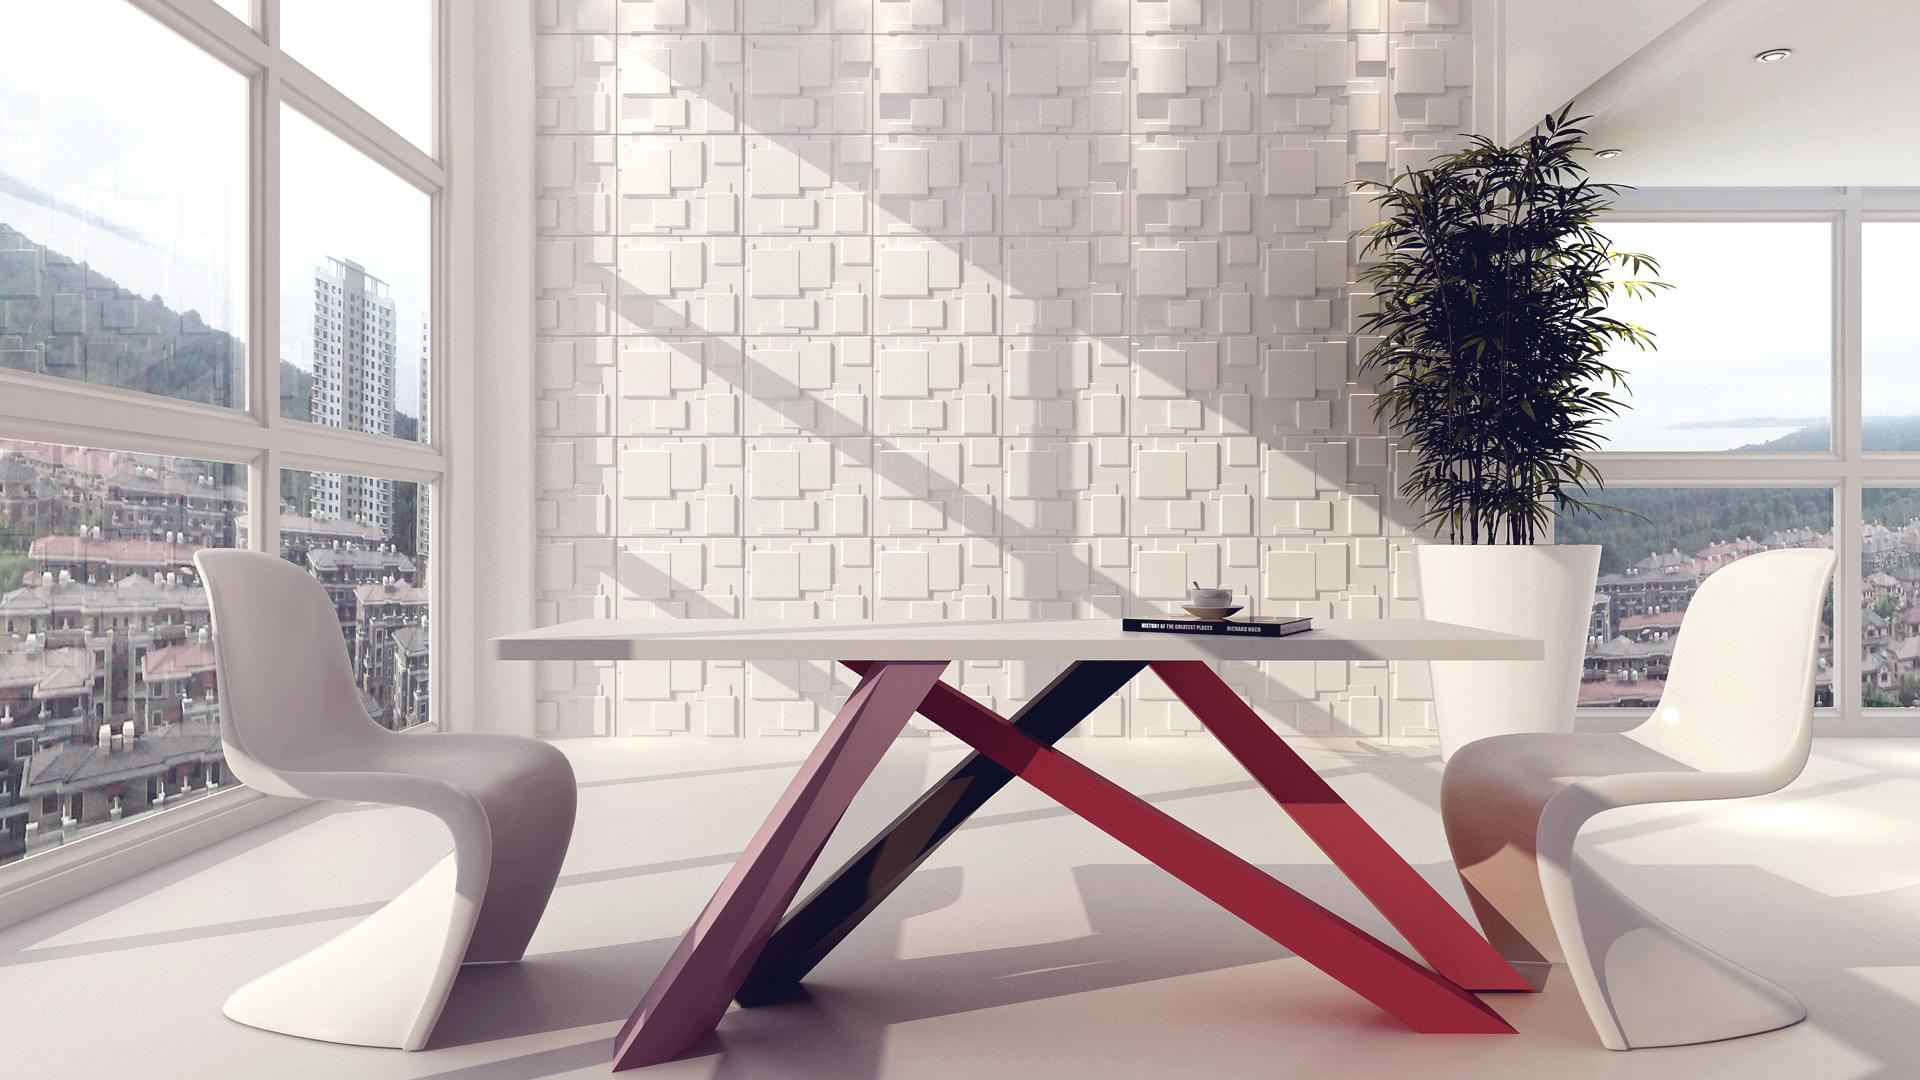 3D Wandpaneele - Choc - Deckenpaneele - 3D Tapeten - Verblender